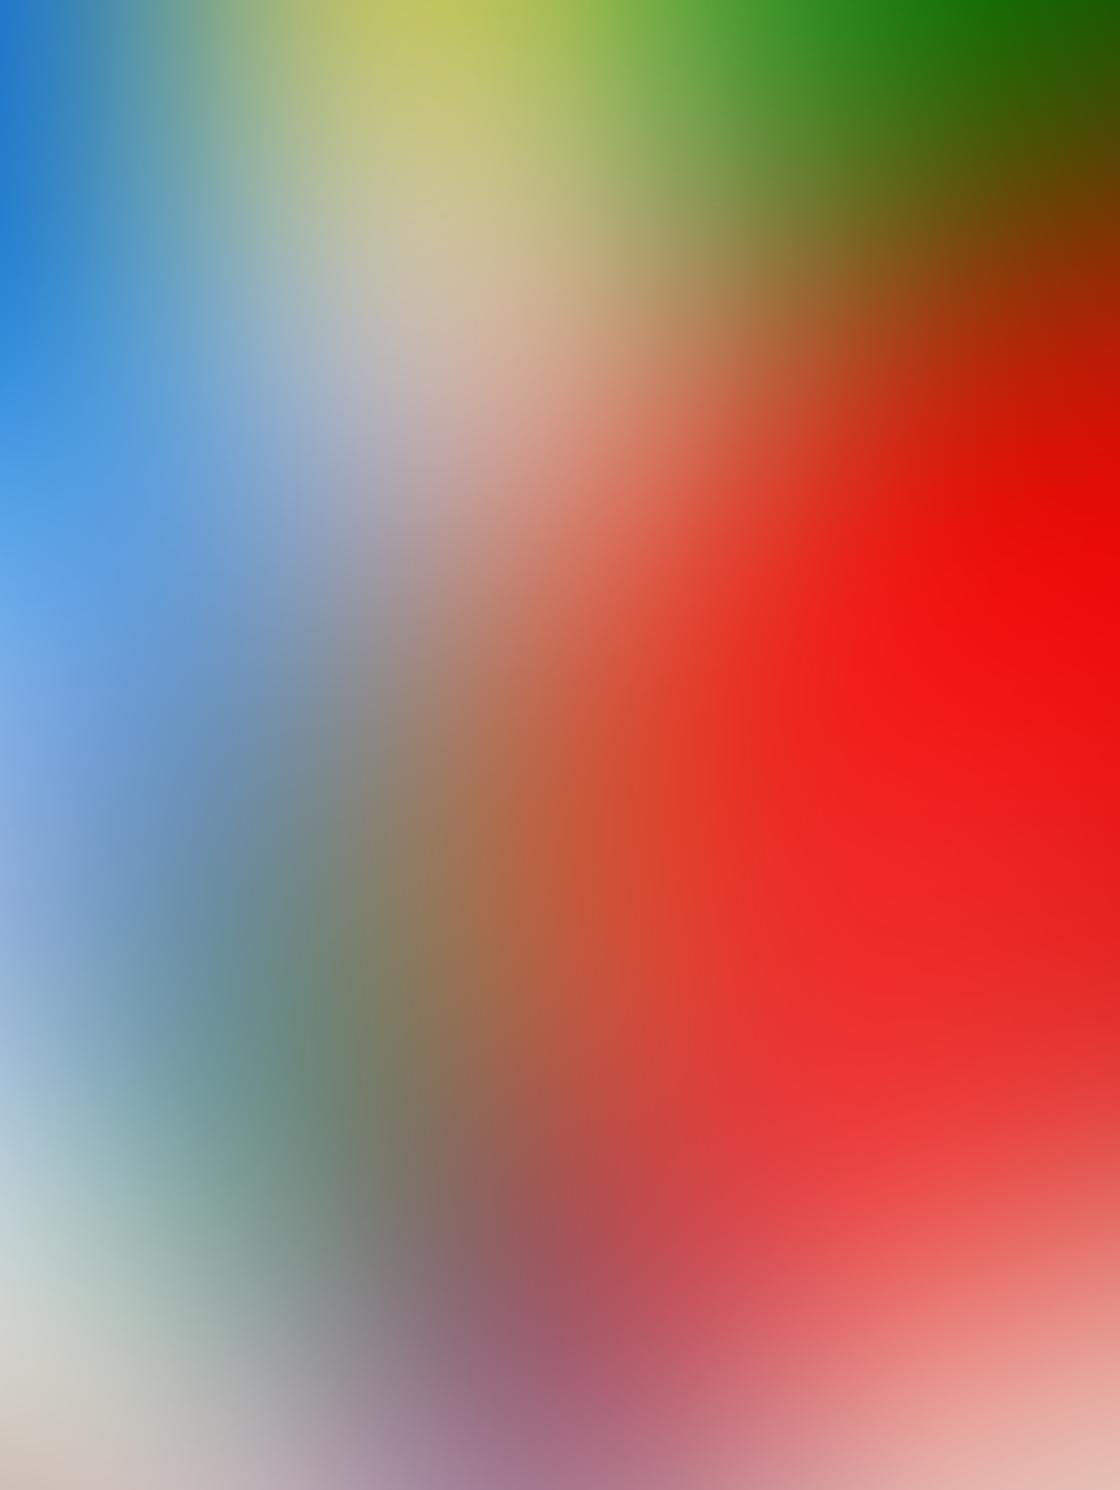 iPhone Photos Editing Styles 5